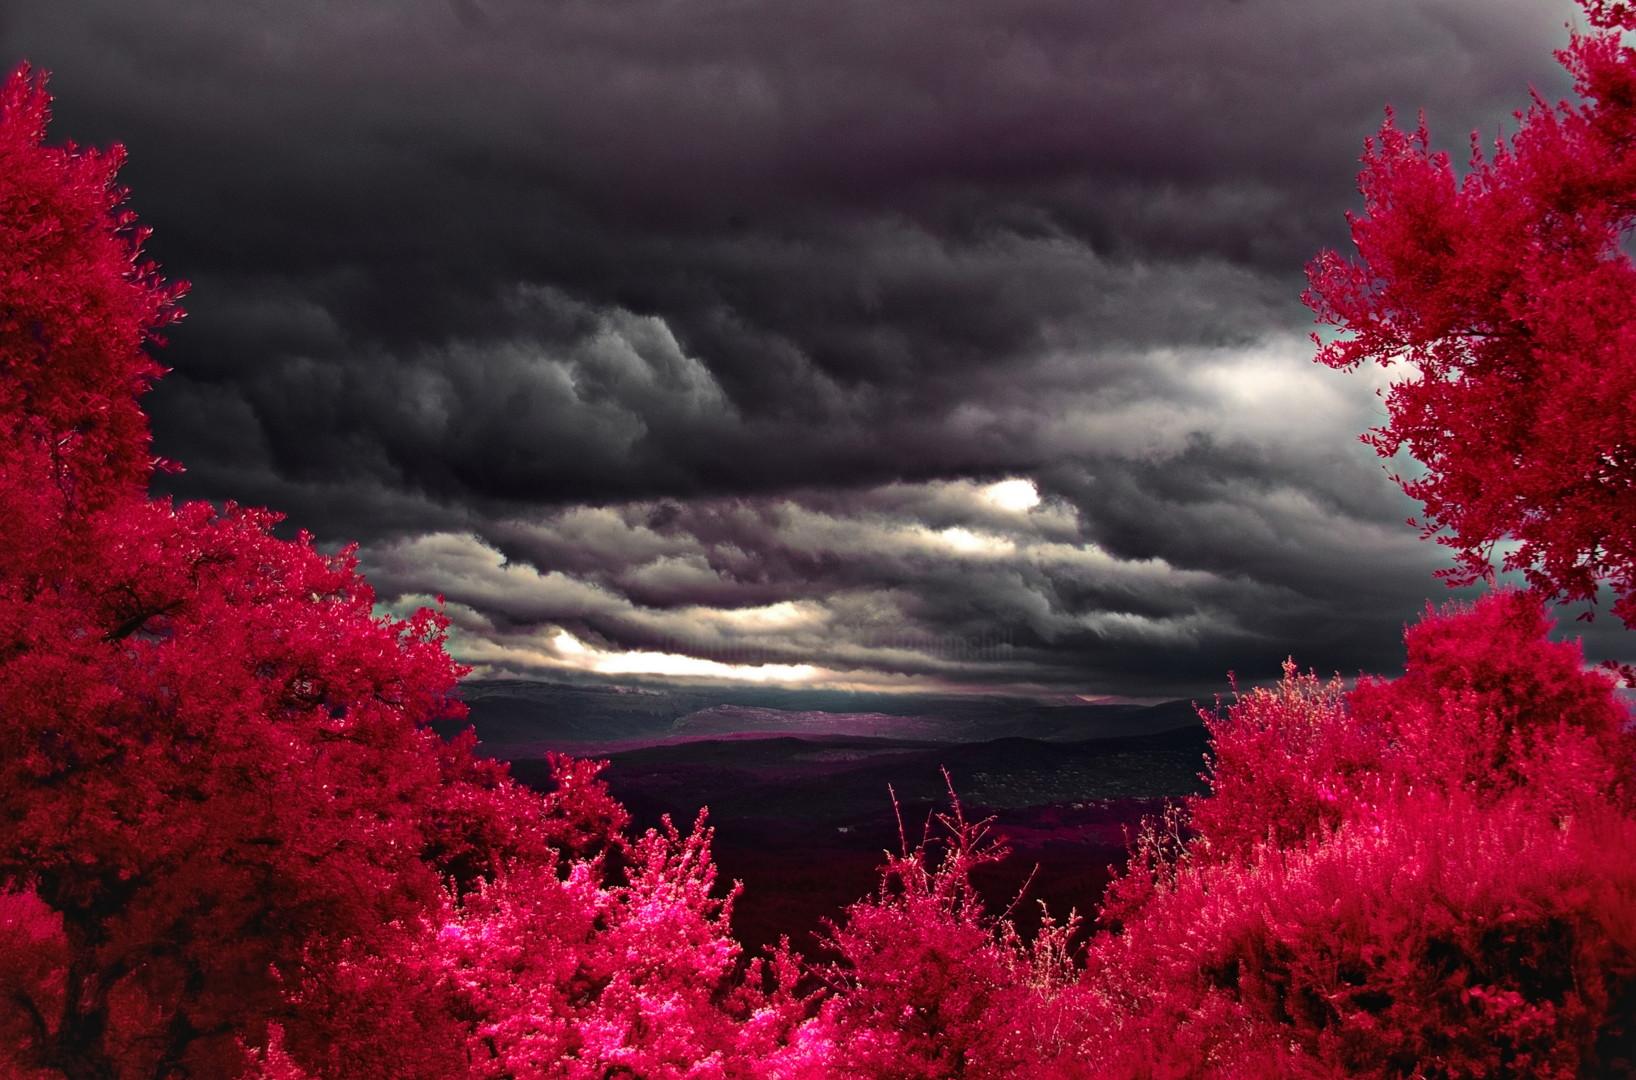 Steevens Hill - Infra Storm